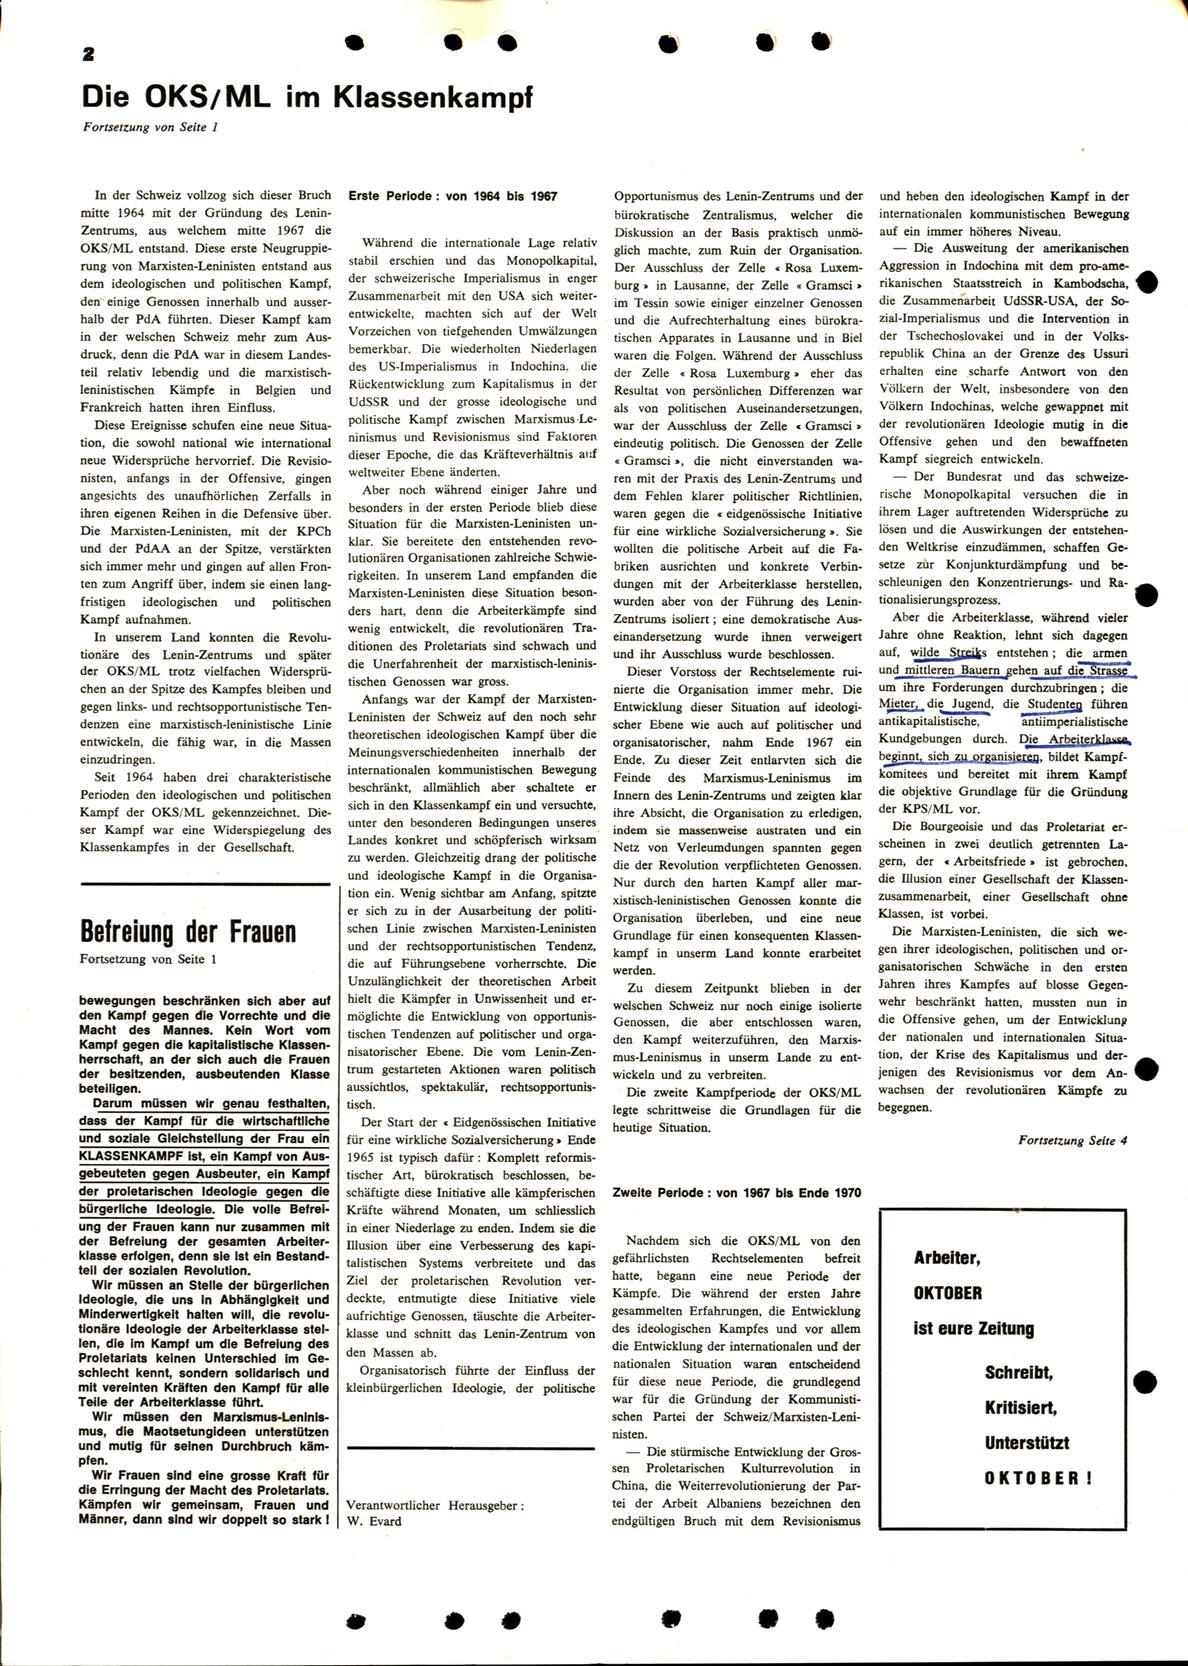 Schweiz_KPSML_Oktober_19720300_048_002